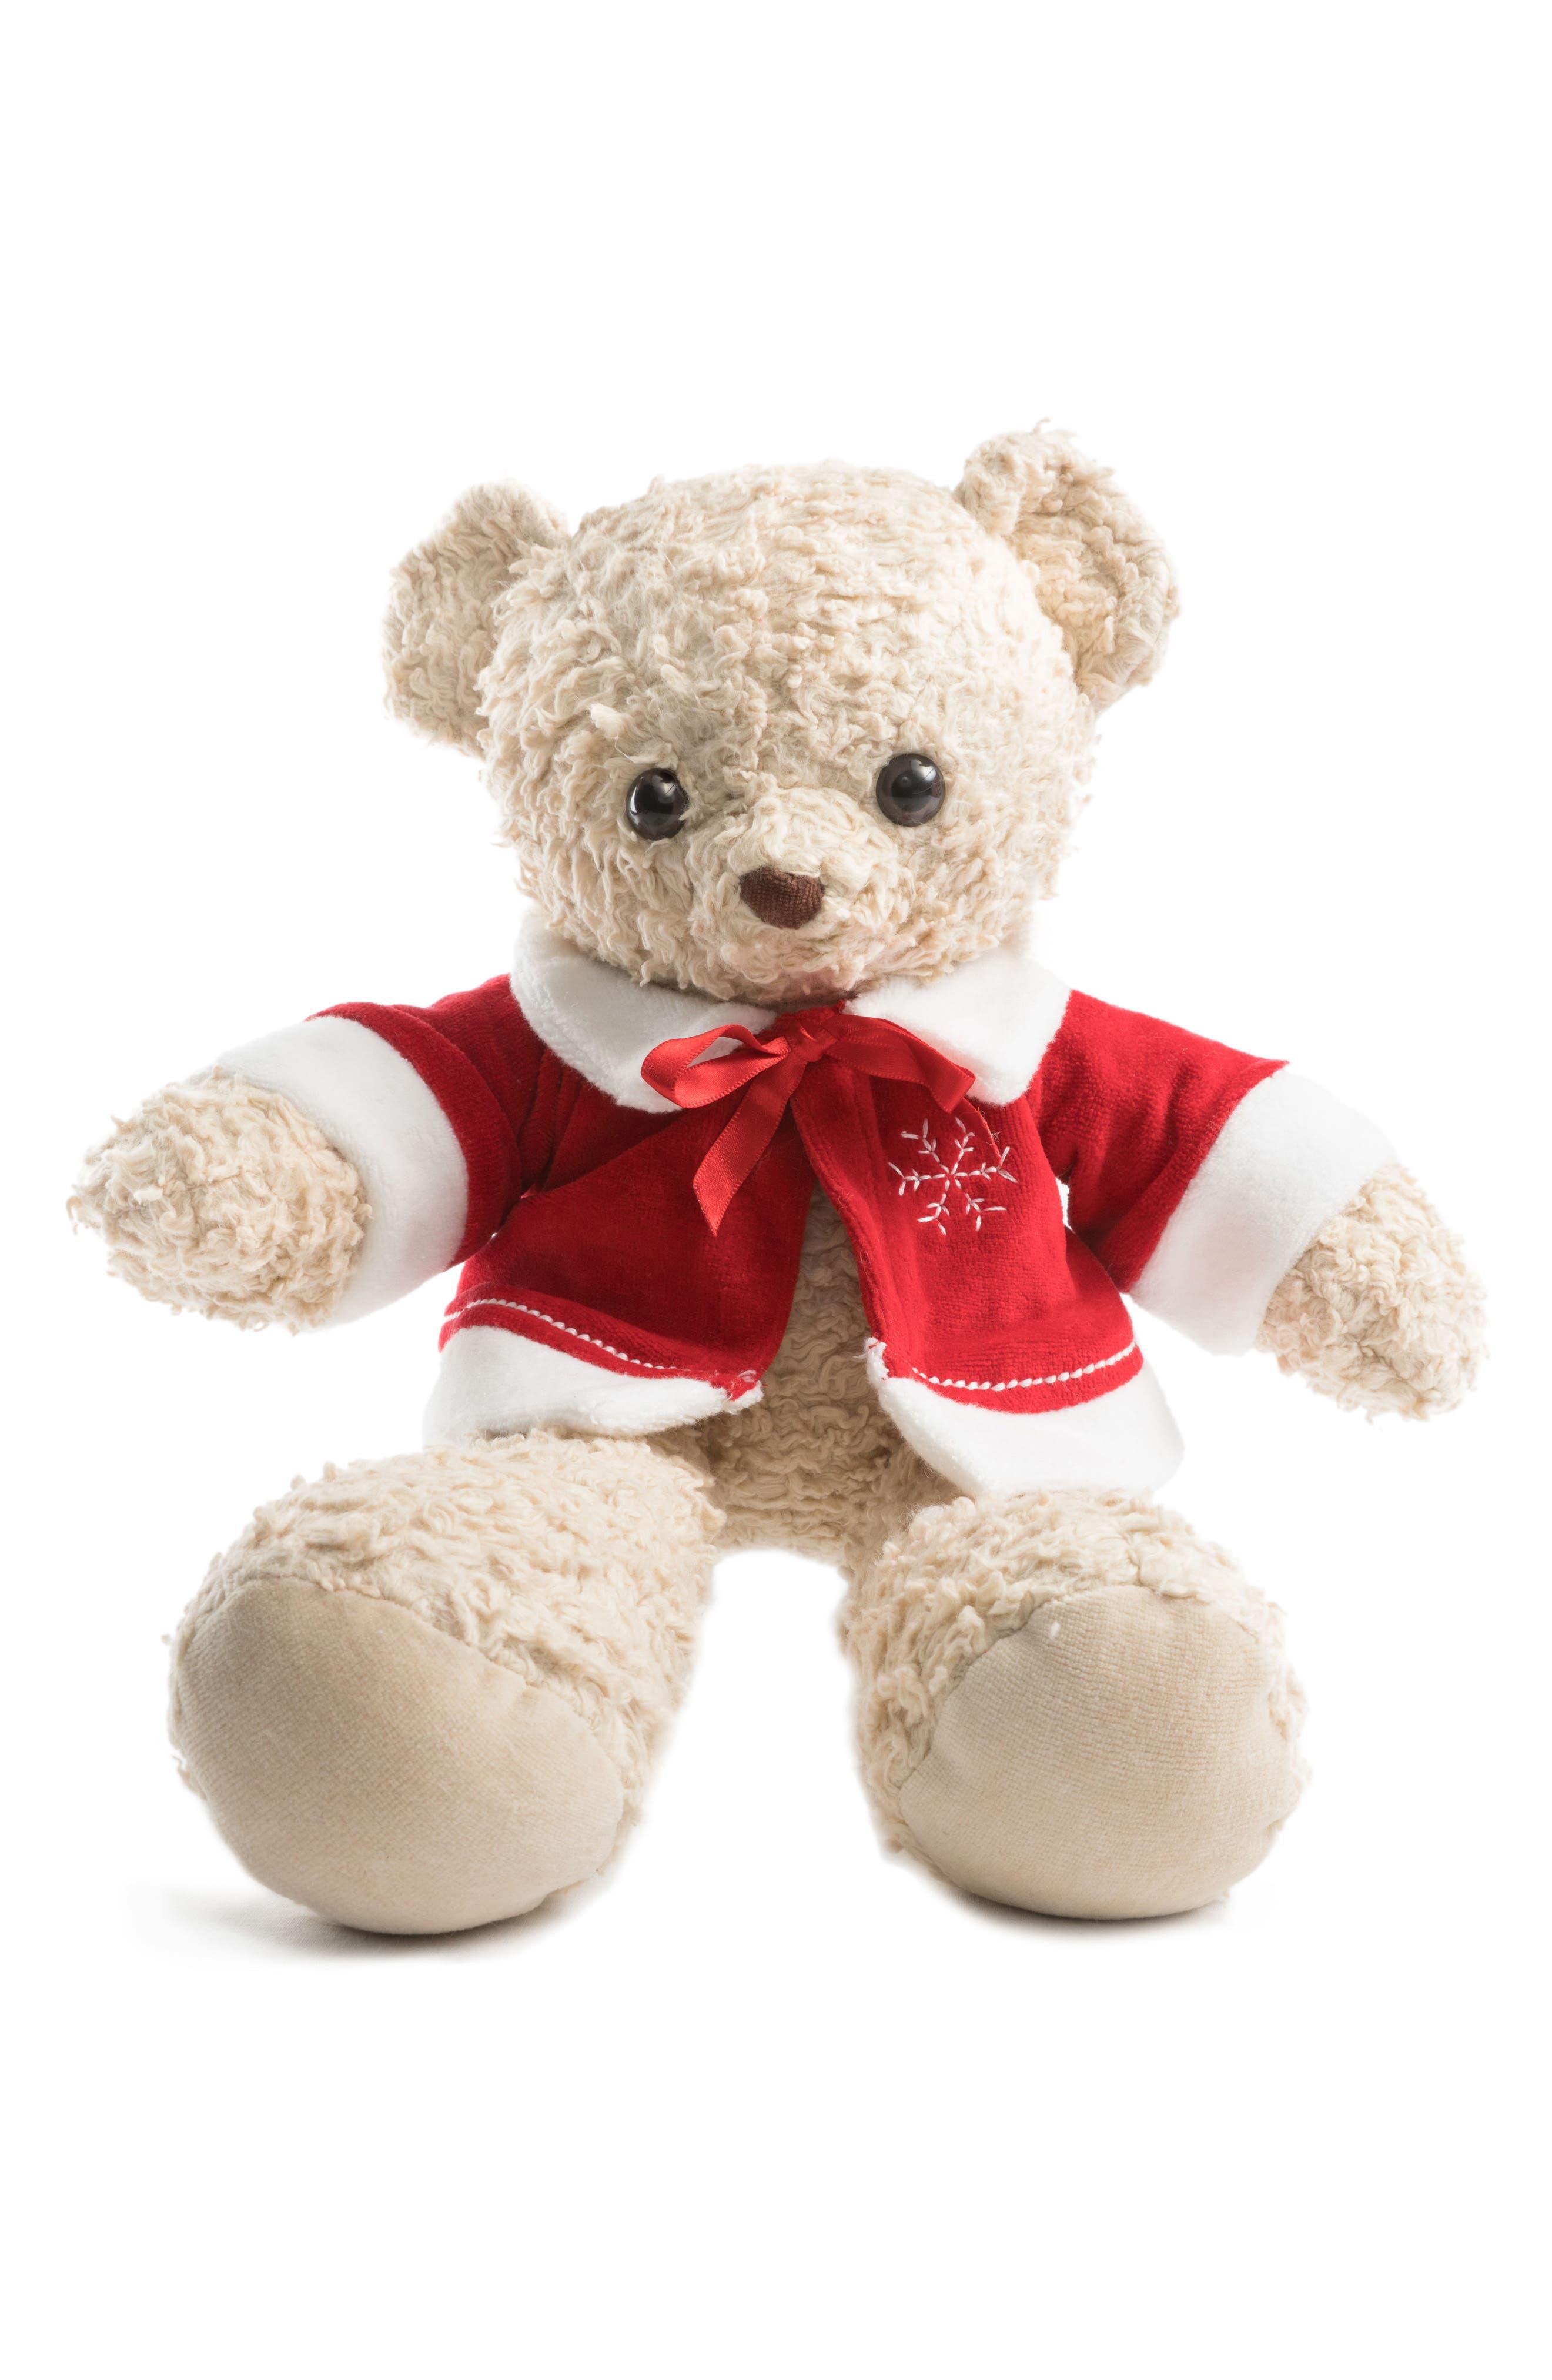 Medium Stuffed Bear with Holiday Jacket,                             Main thumbnail 3, color,